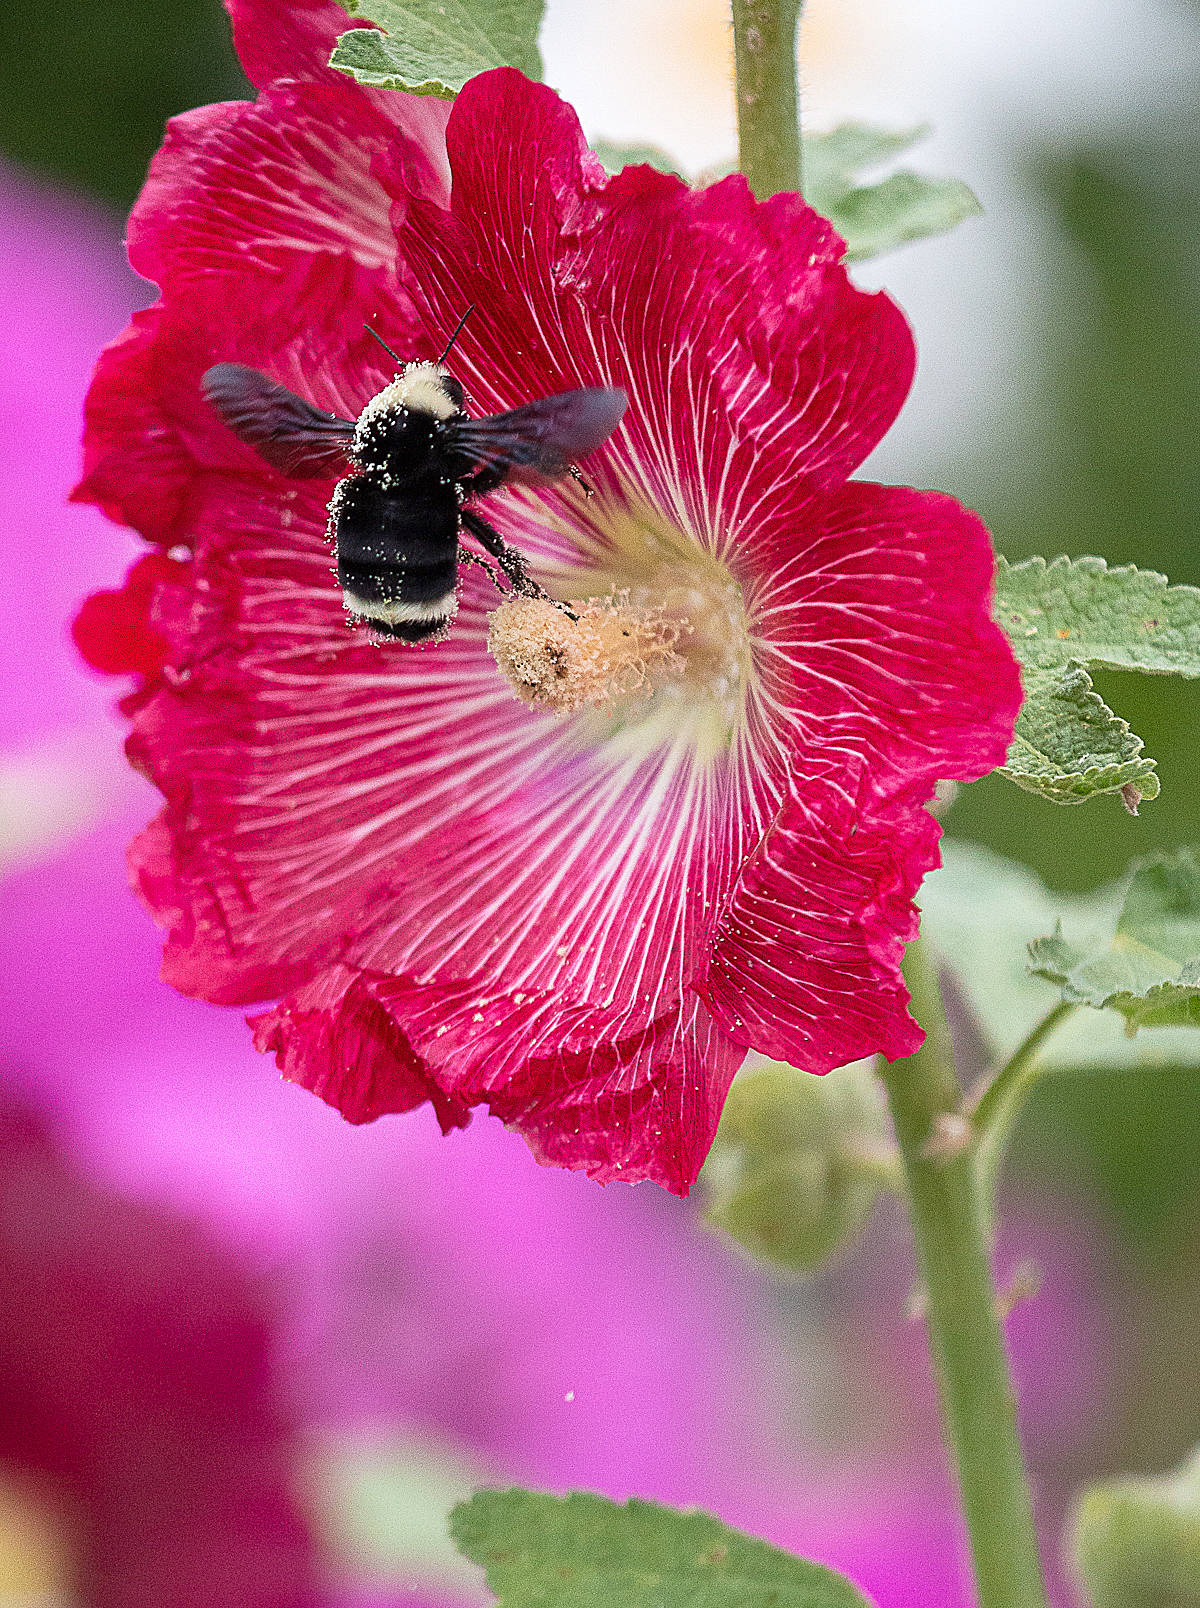 A bee visited Iris Schurz's hollyhock in her Langley City home. (Iris Schurz/Special to the Langley Advance)